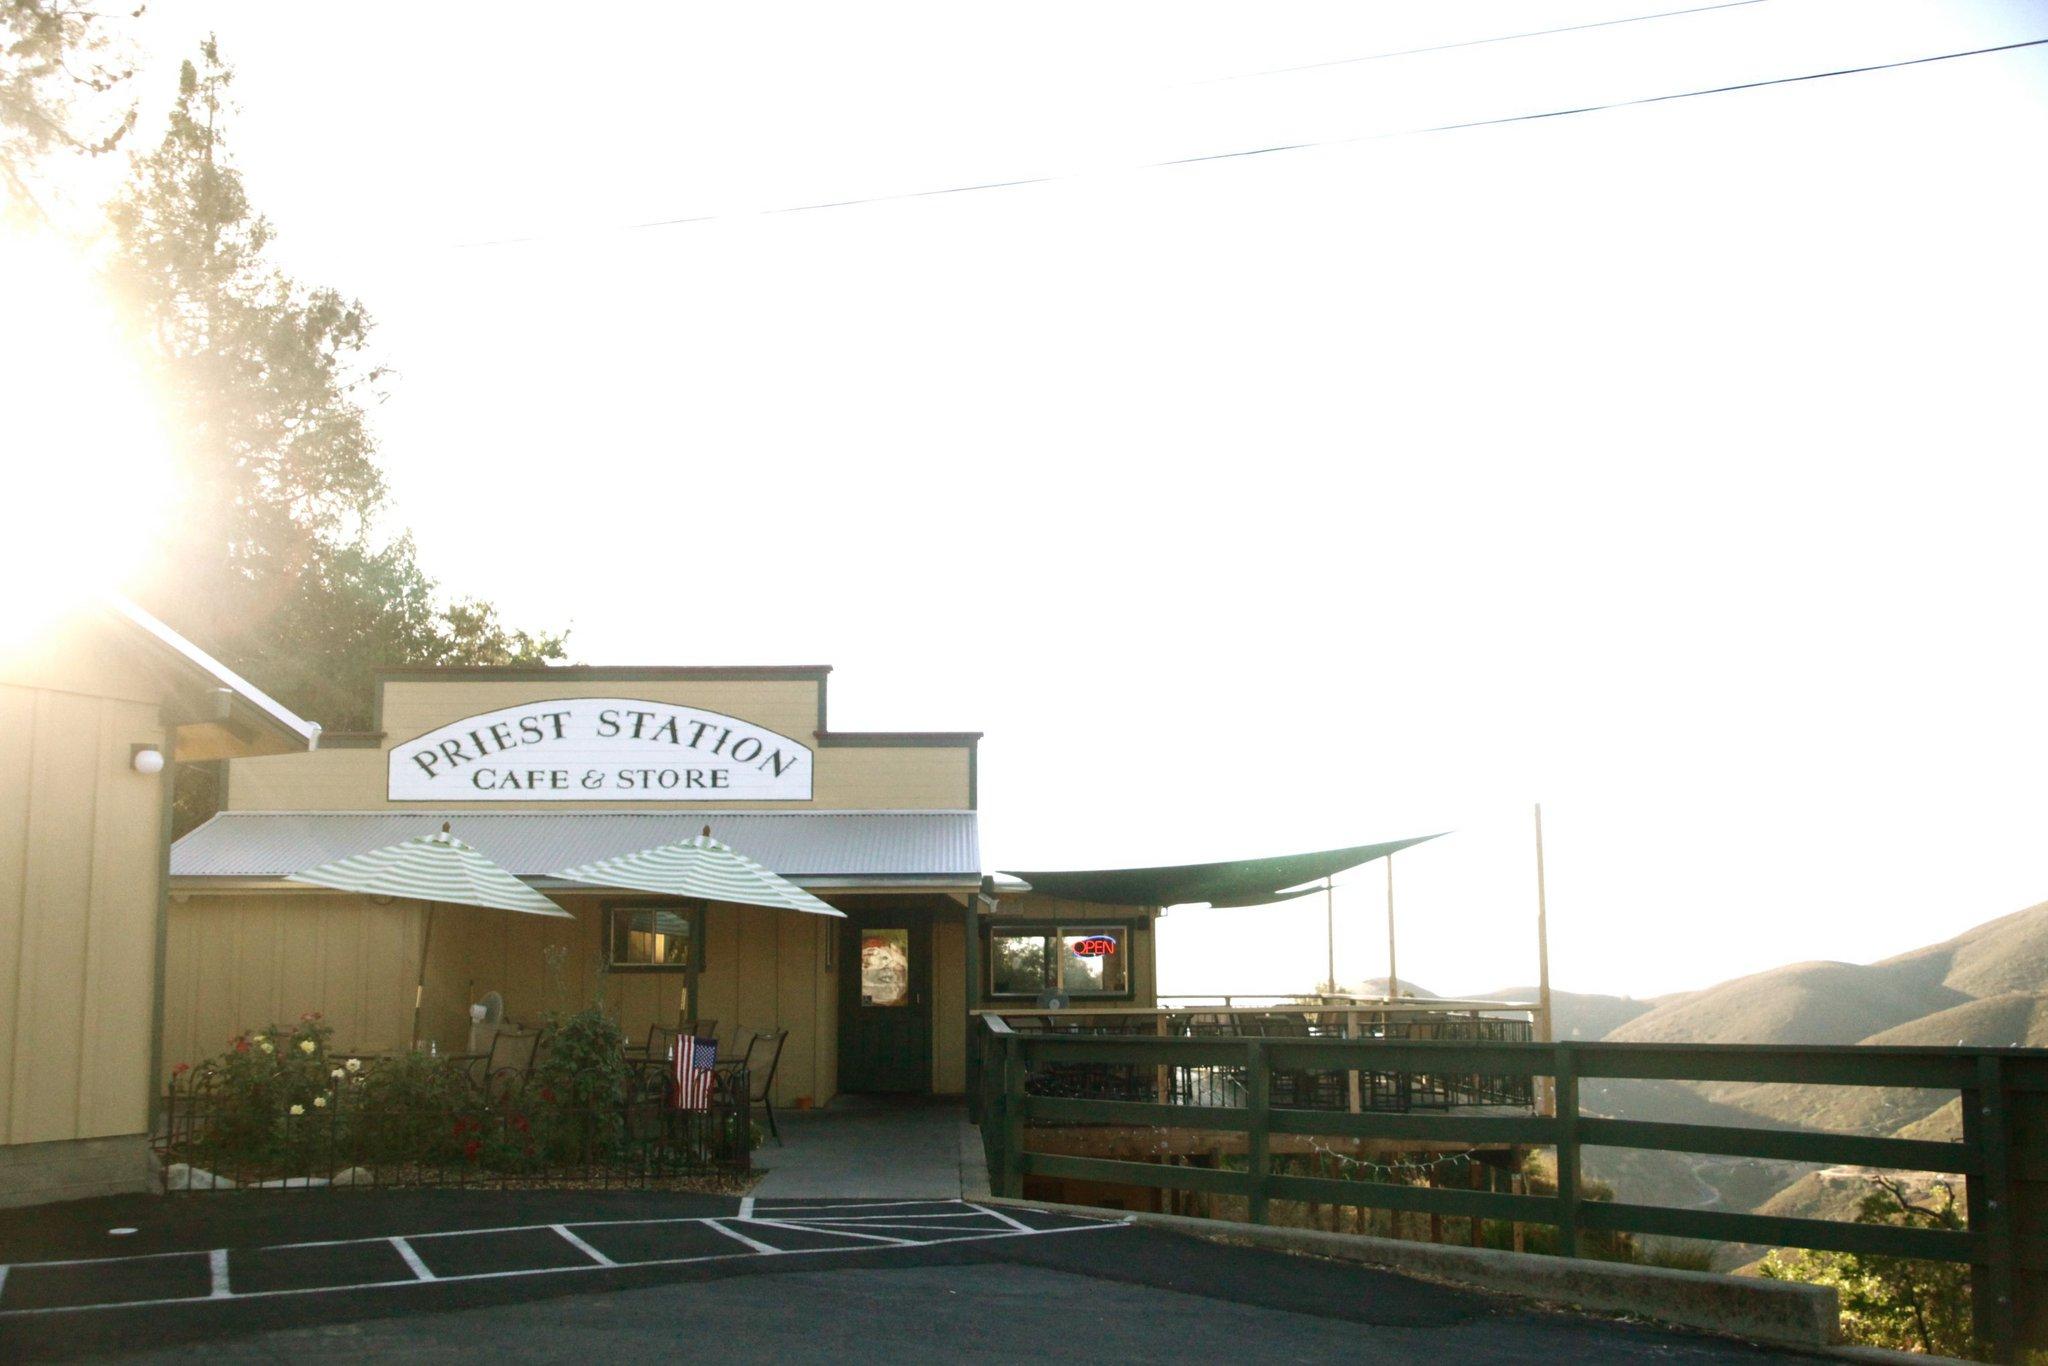 Priest Station Cafe